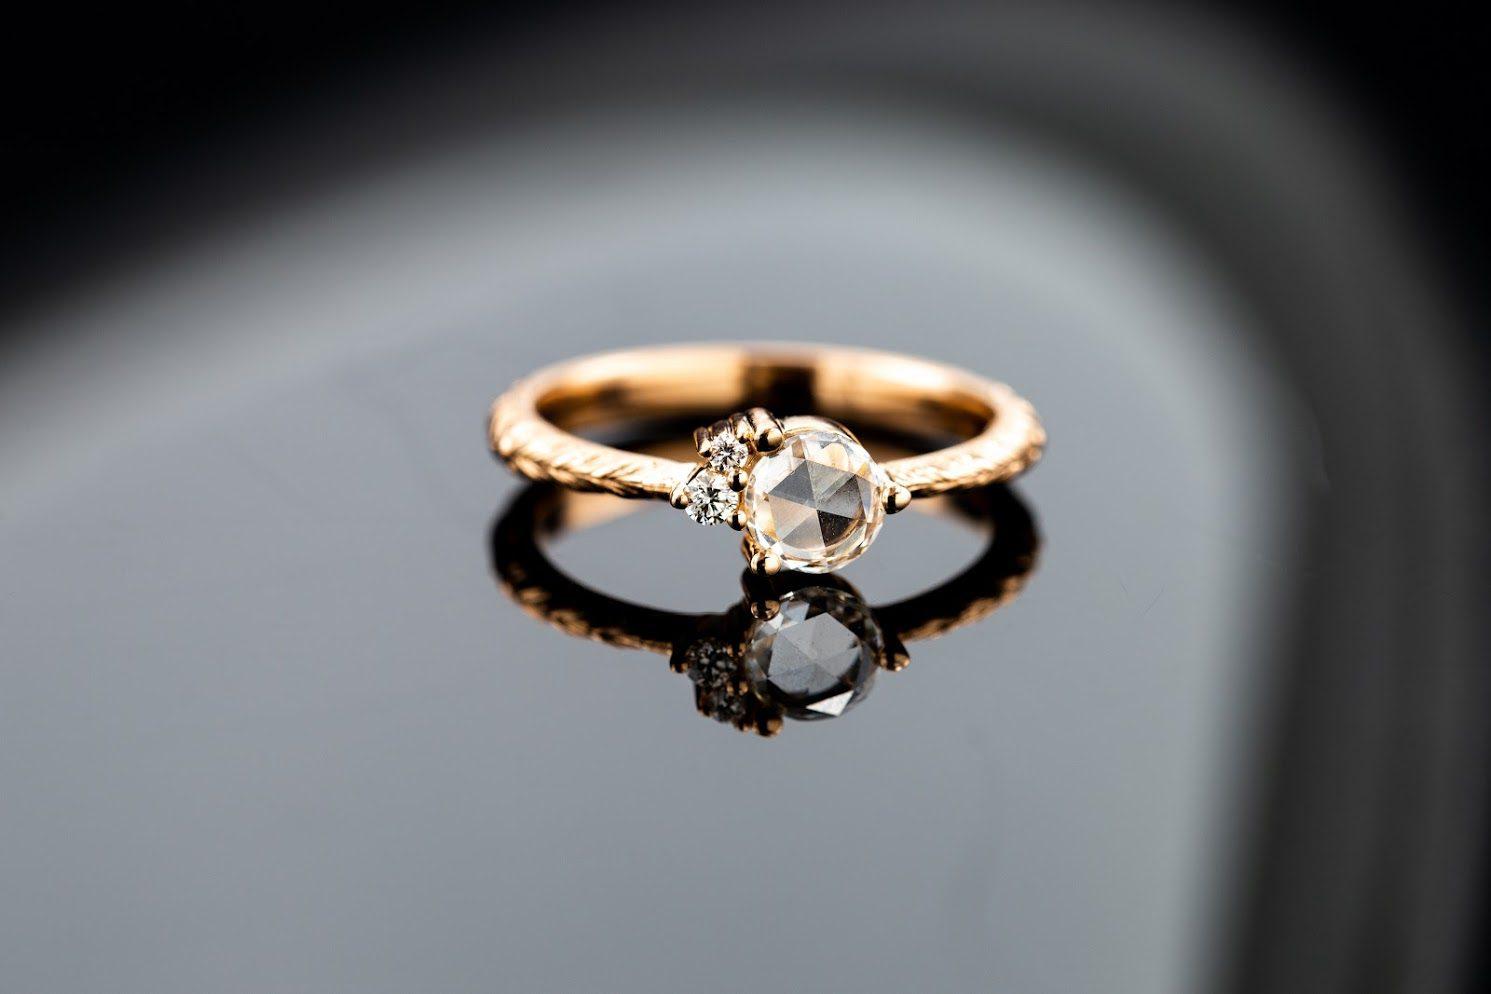 rose cut diamond - vintage engagement rings